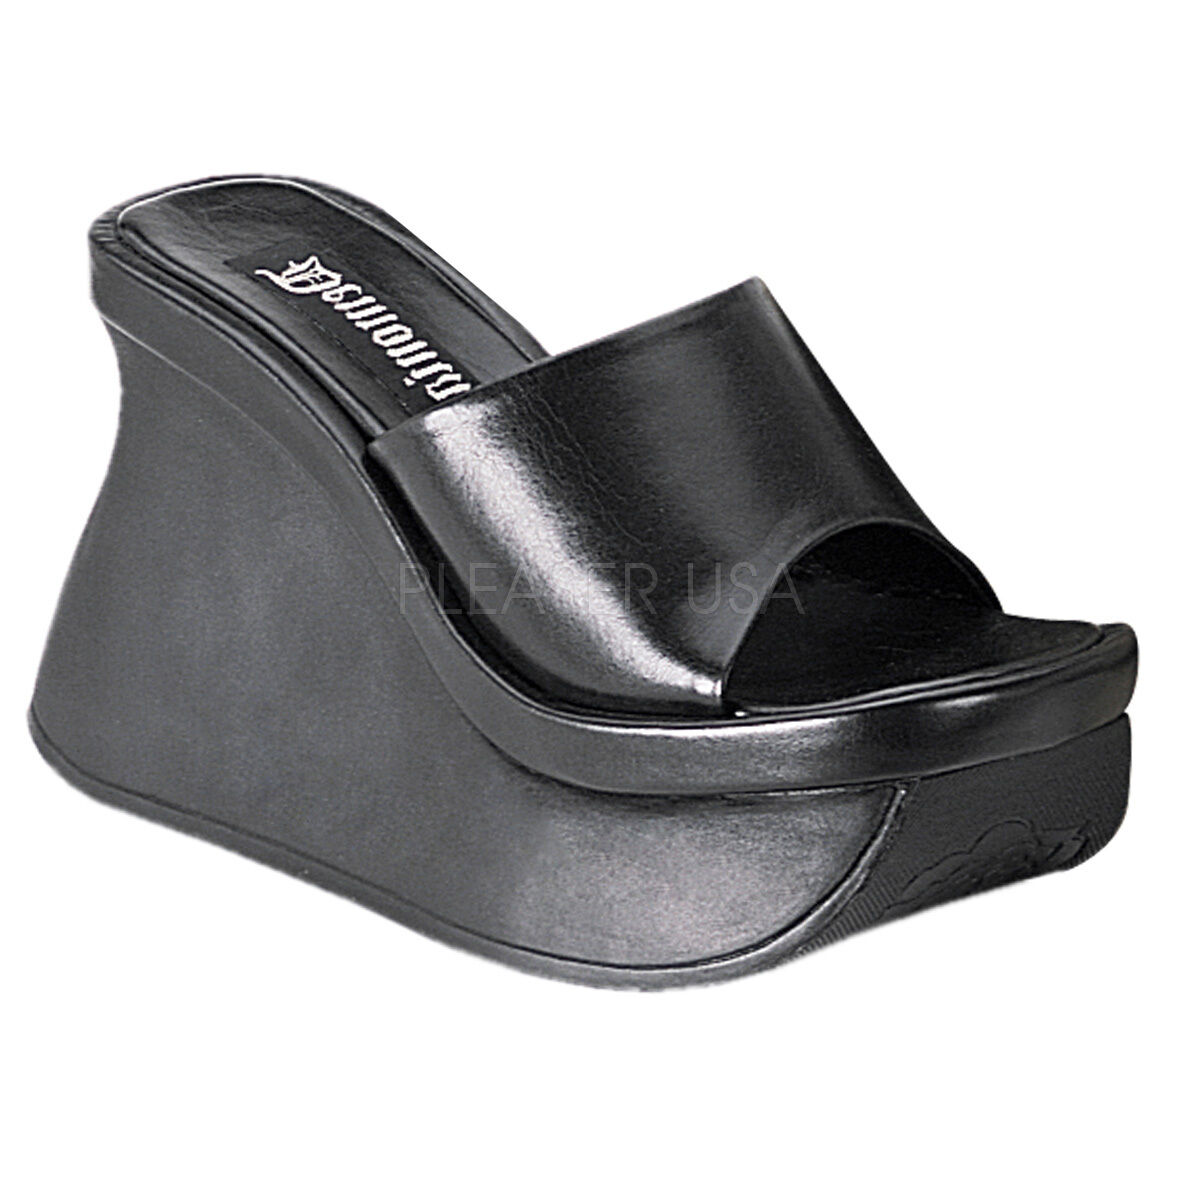 DEMONIA PAC01 B PU Women's Black Gothic Platform Wedge Sandals 4 1 2  High Heels